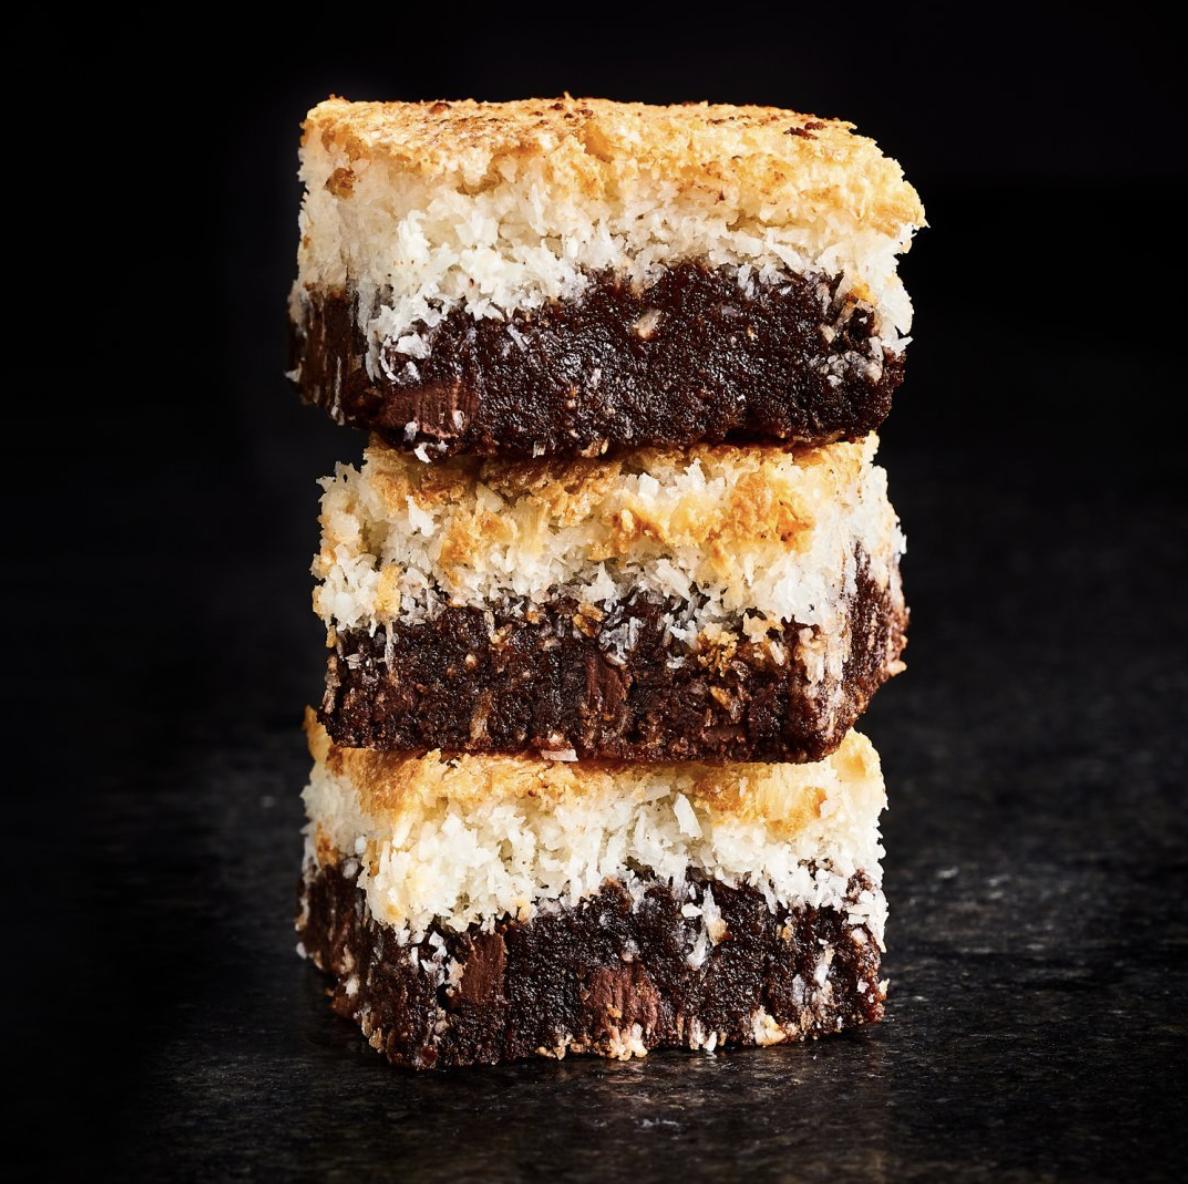 Greg DuPree coconut macaroon brownies